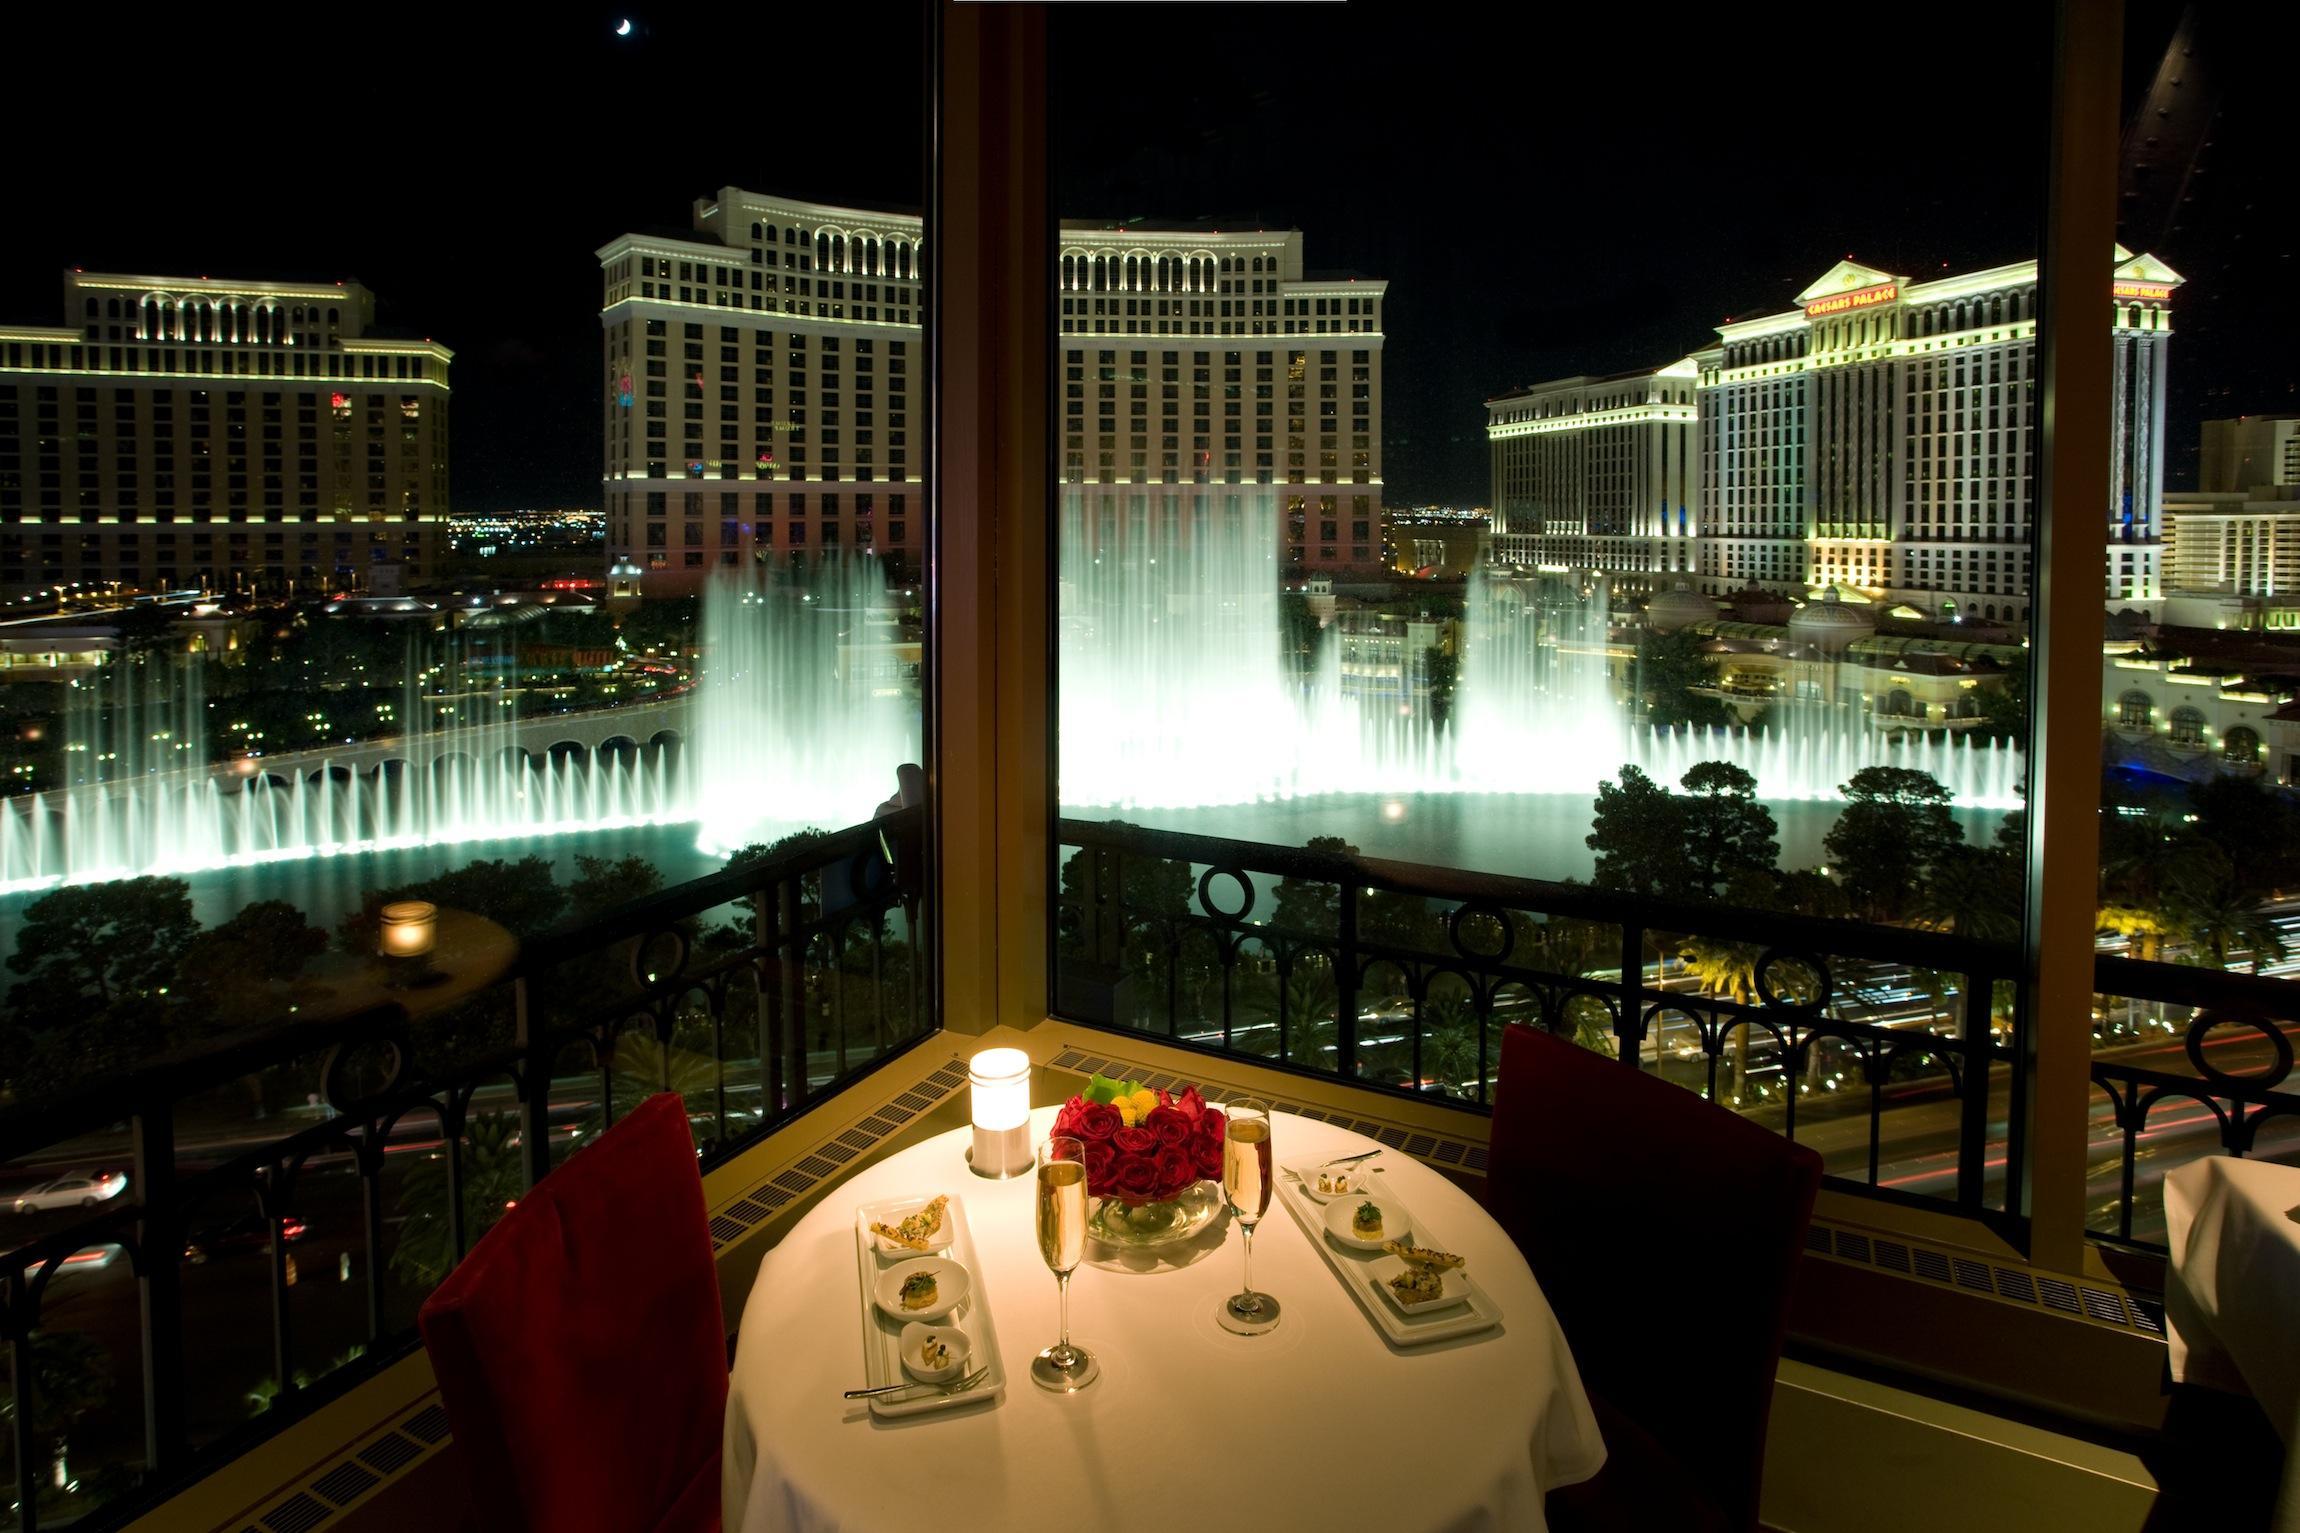 Best Views in Vegas at Eiffel Tower